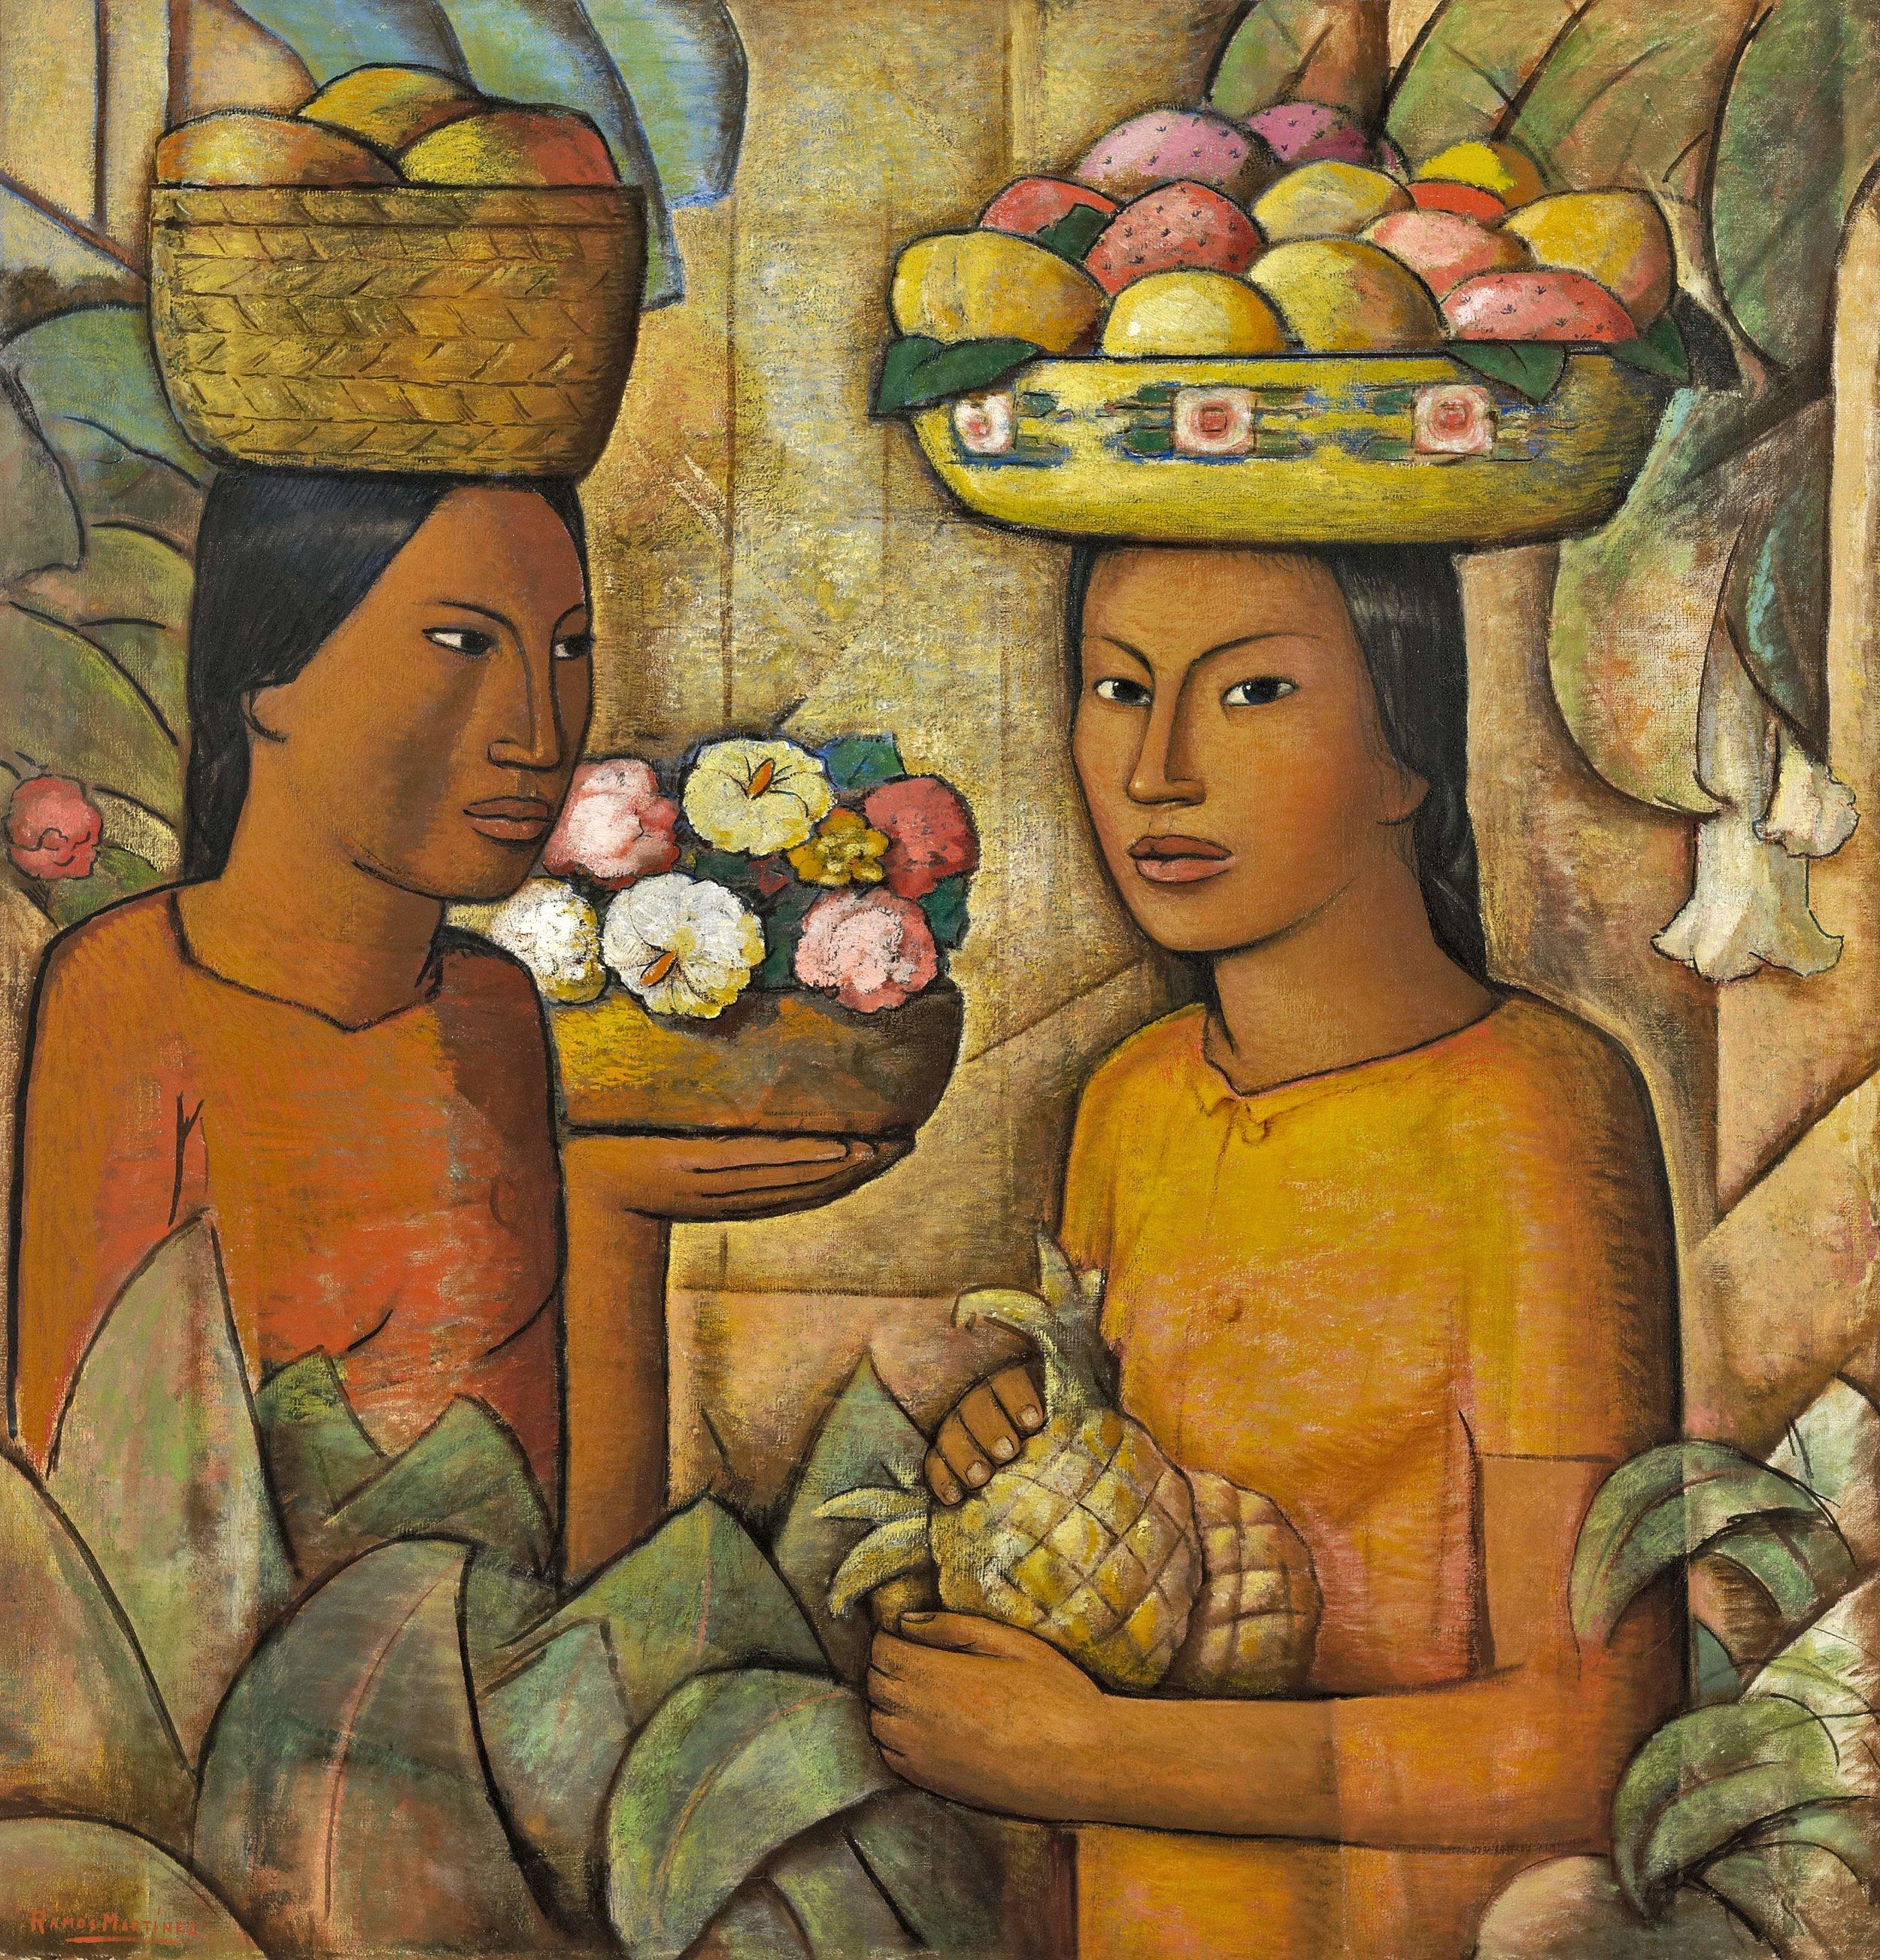 Mujeres con Frutas / Women with Fruit  ca. 1930 oil on canvas / óleo sobre tela 36.5 x 34.5 inches / 92.7 x 87.6 centímetros Private collection